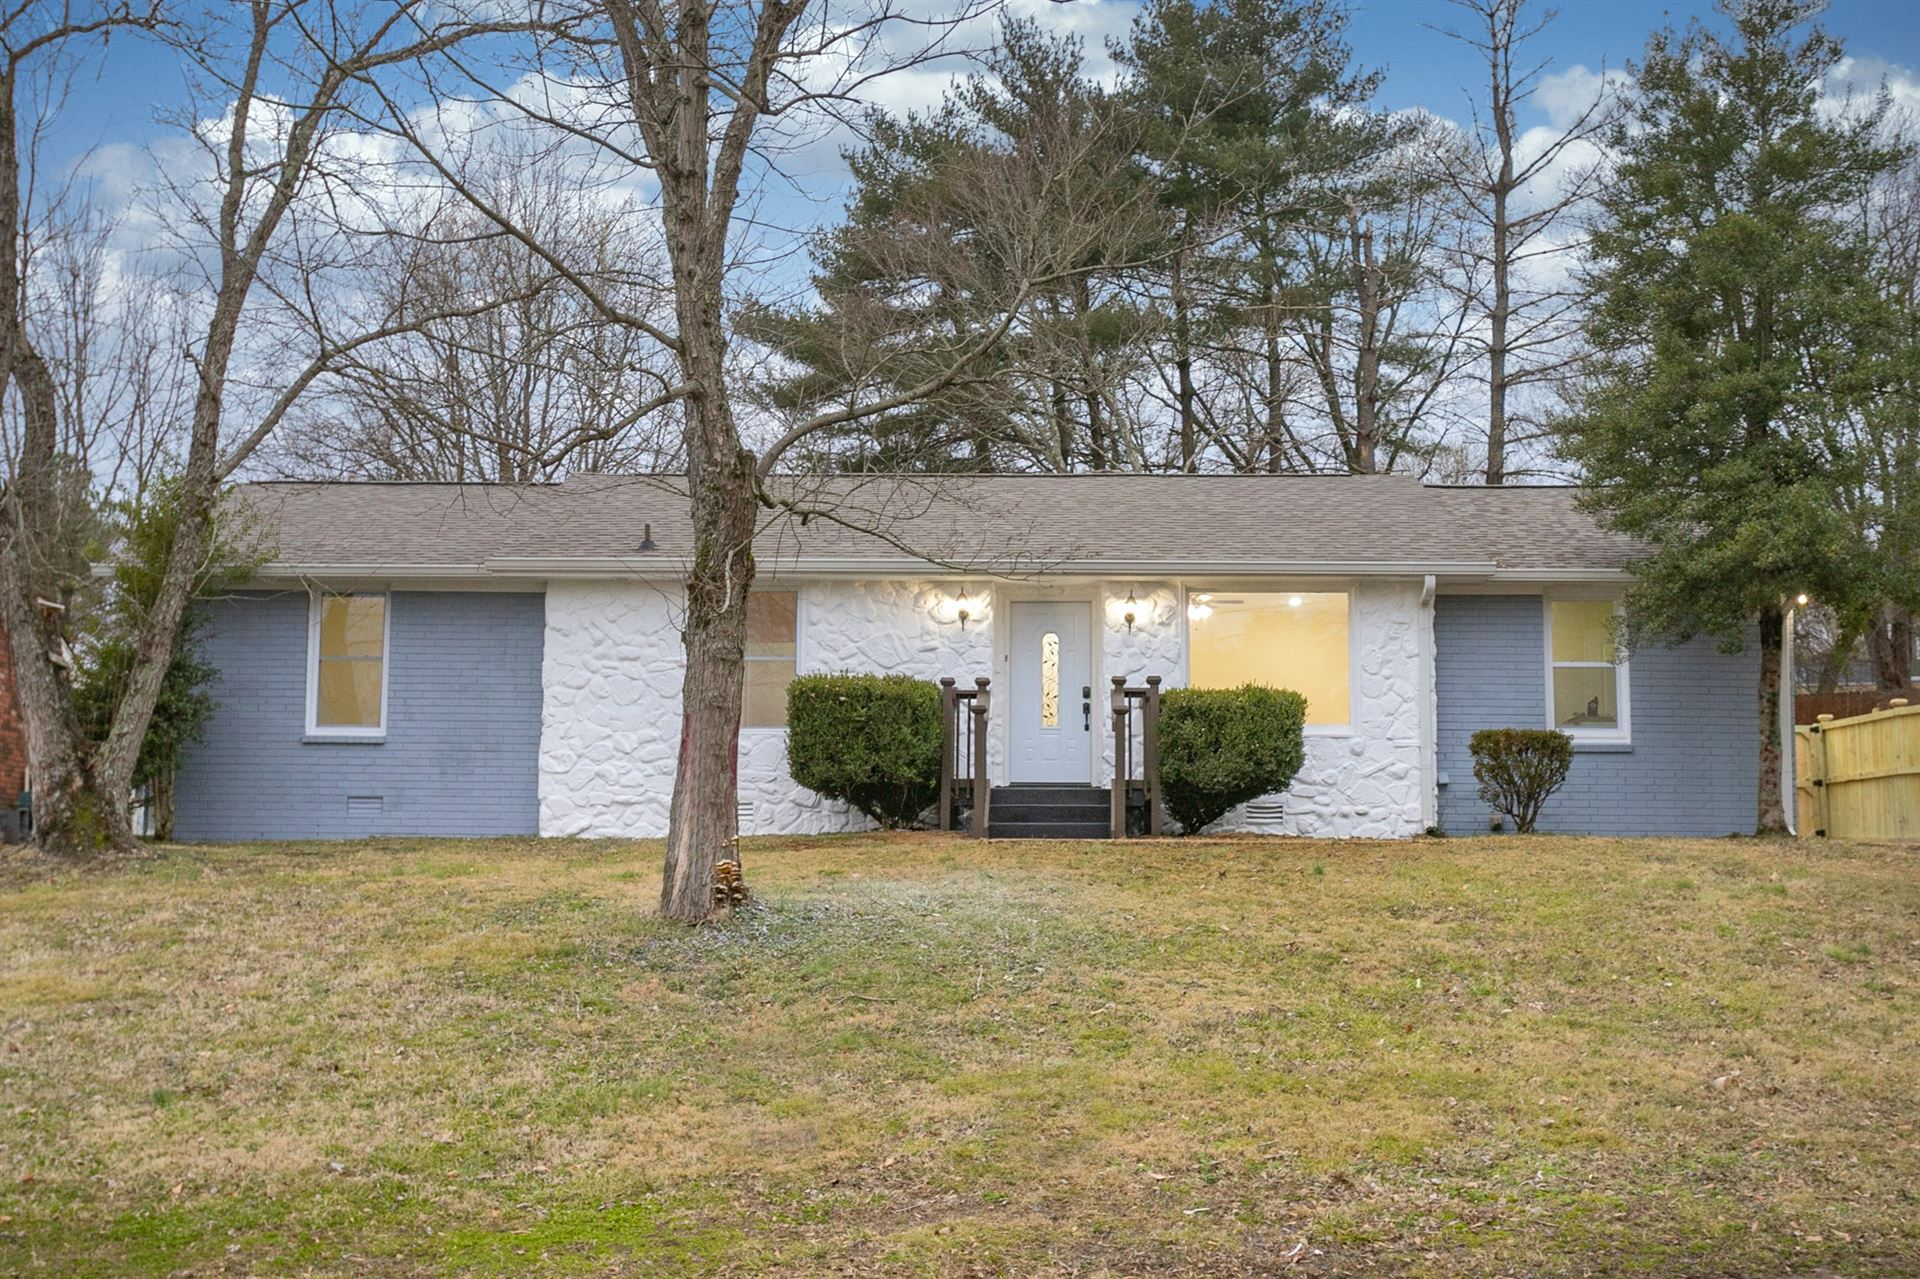 532 Brook View Estates Dr, Antioch, TN 37013 - MLS#: 2231593